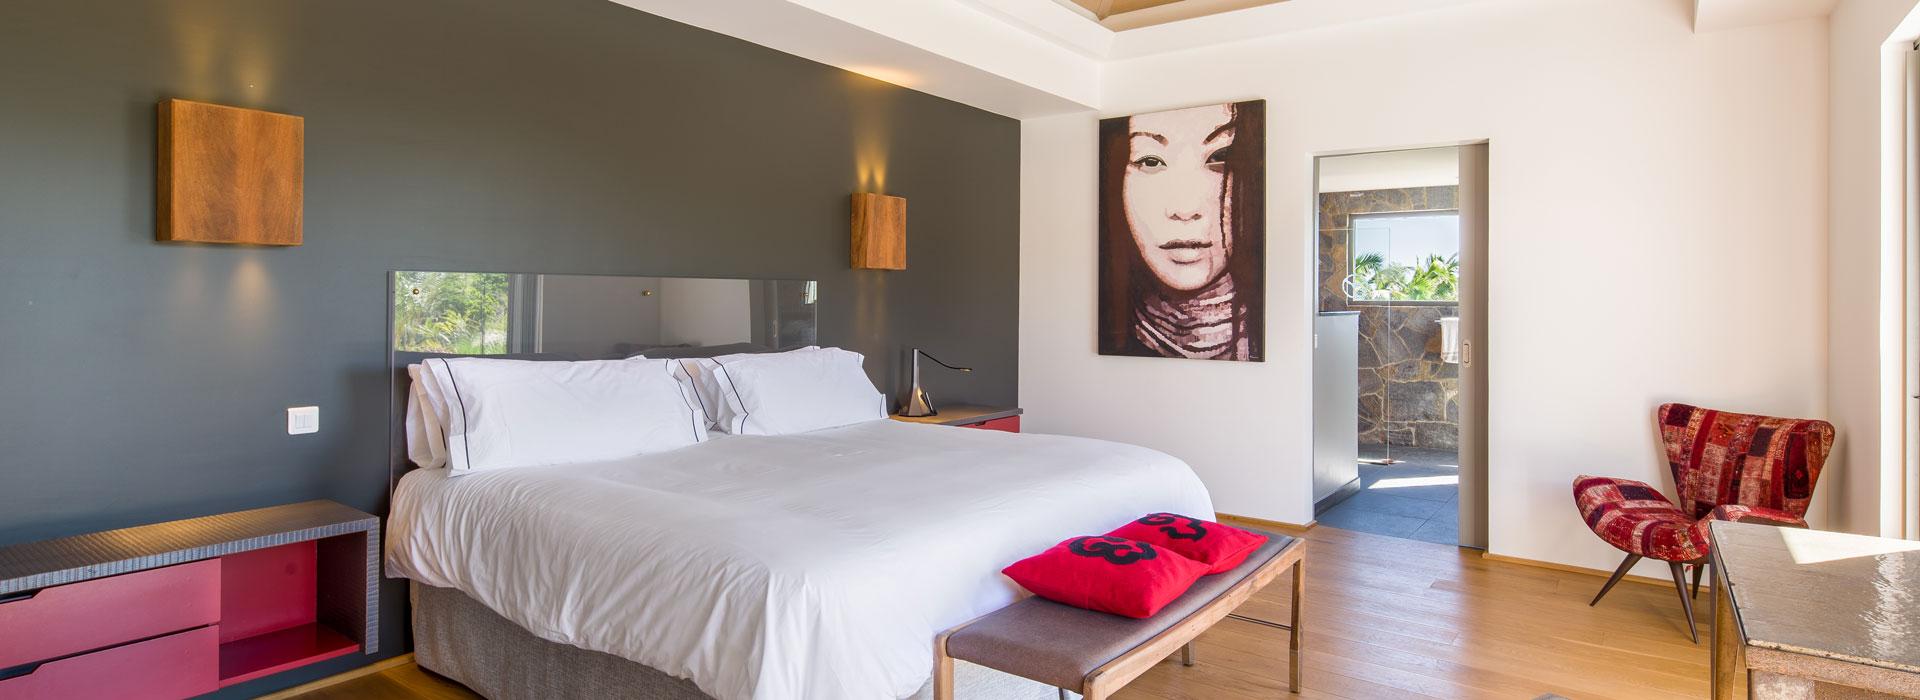 Photographe Hotel Nantes Loire-Atlantique